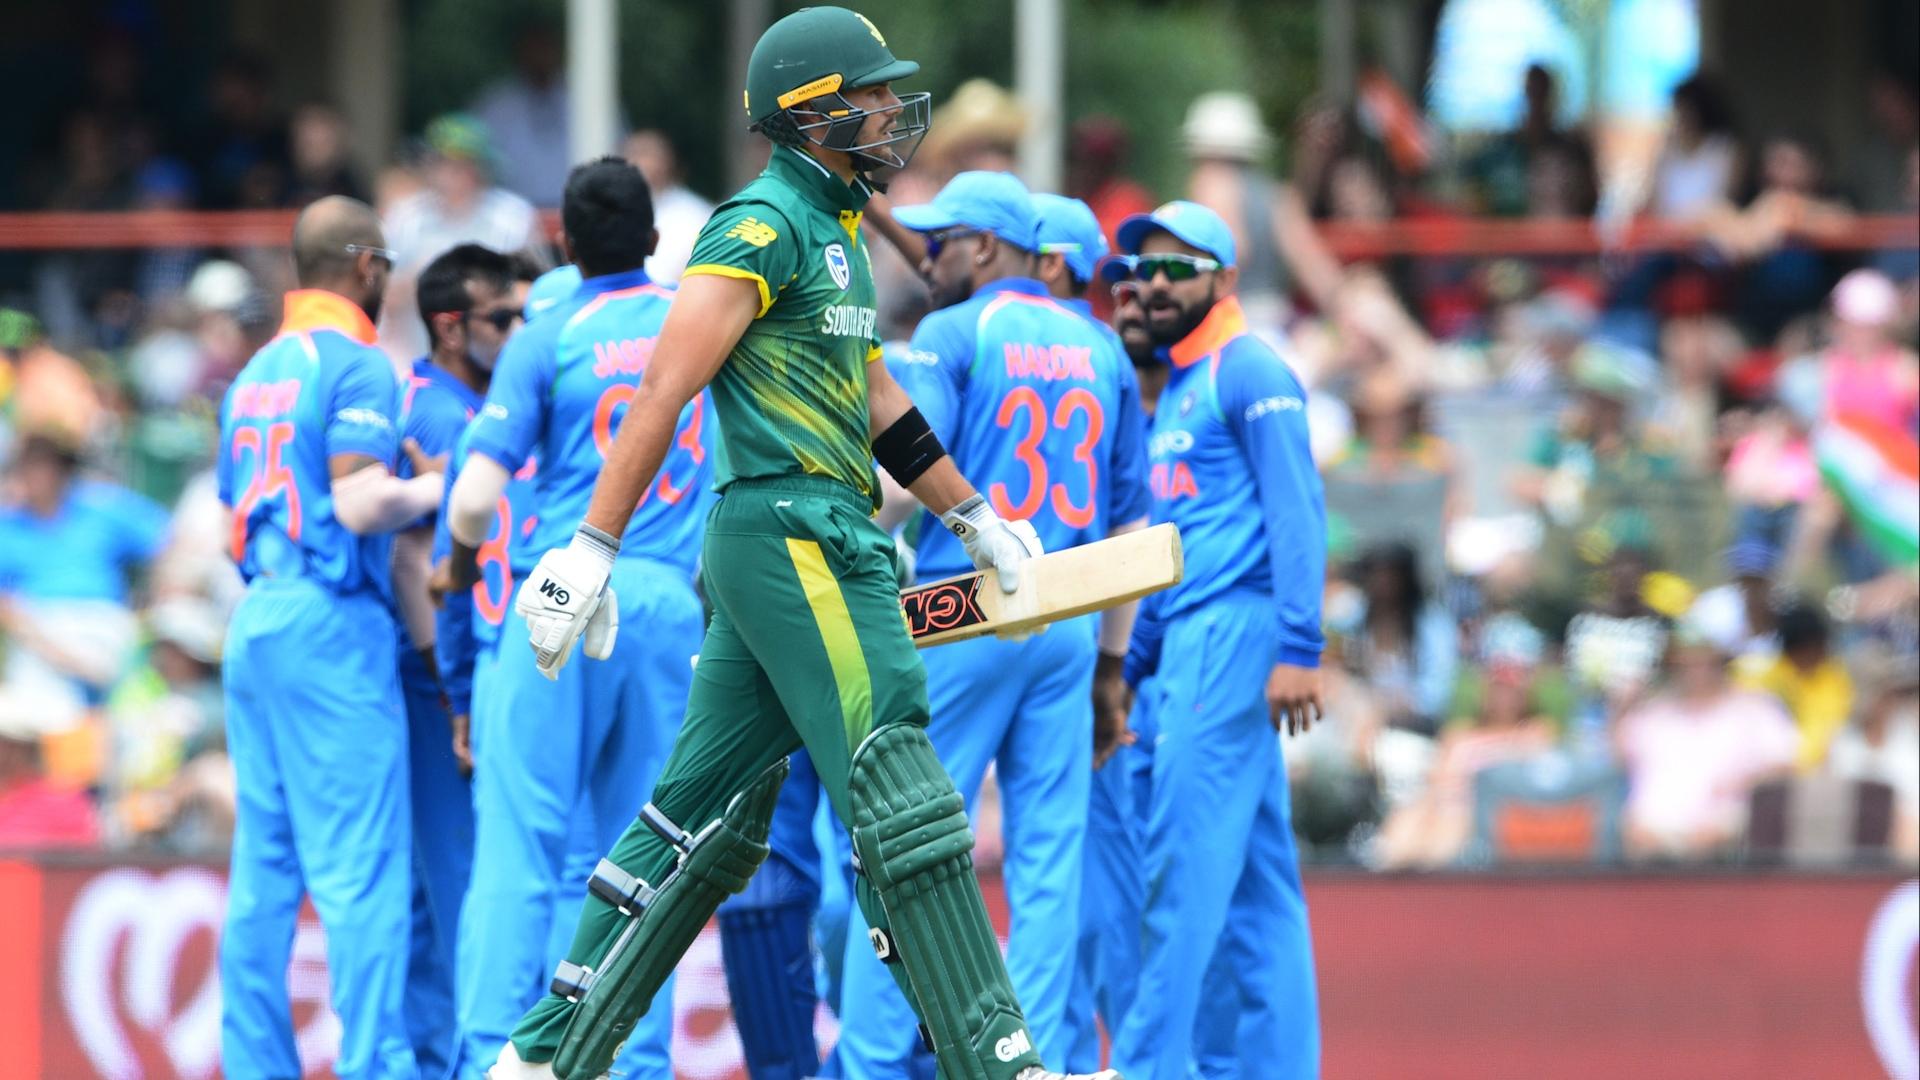 India vs south africa 6th odi live score board